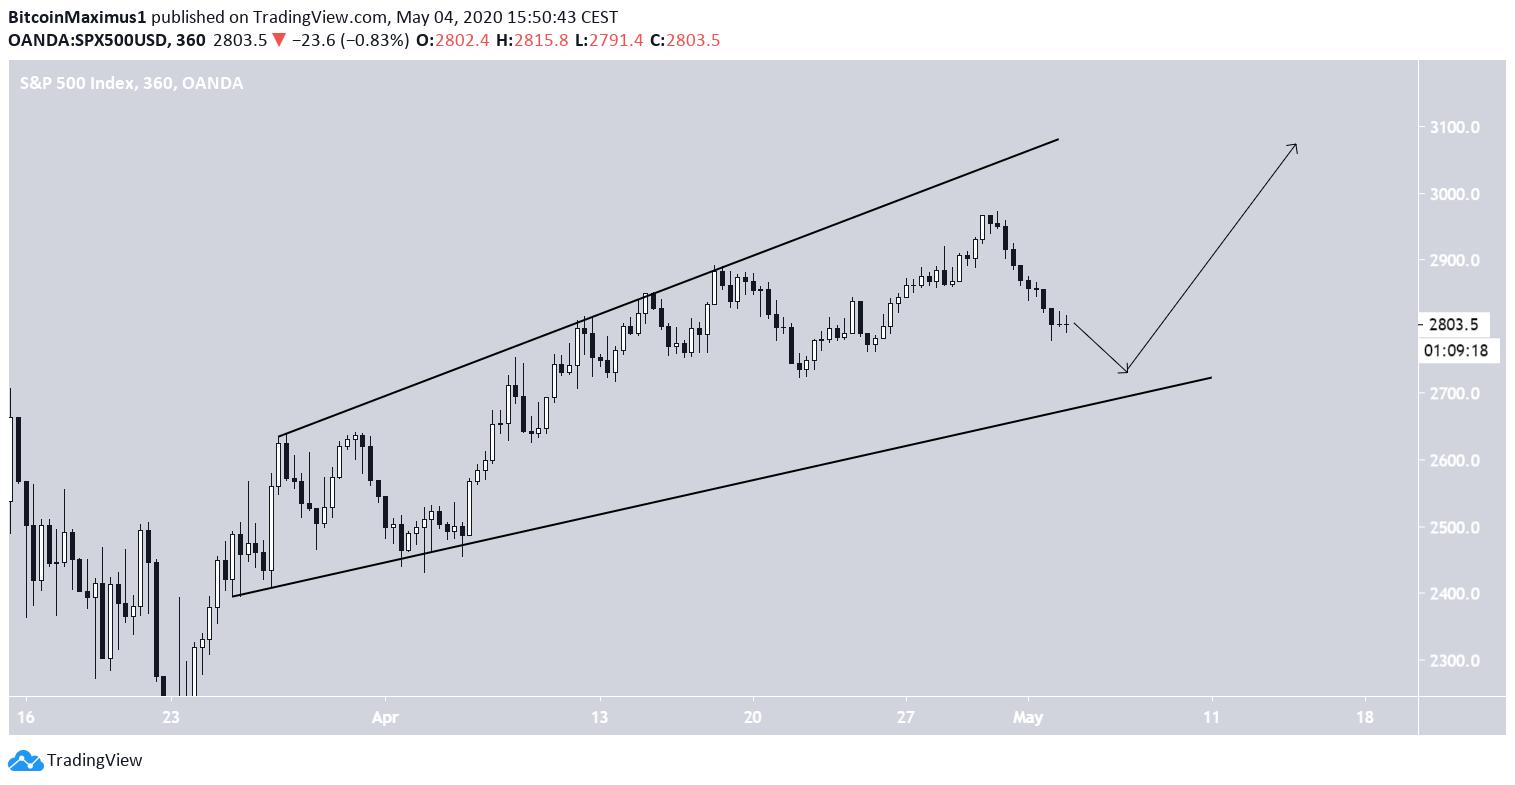 S&P 500 Ascending Broadenign Wedge